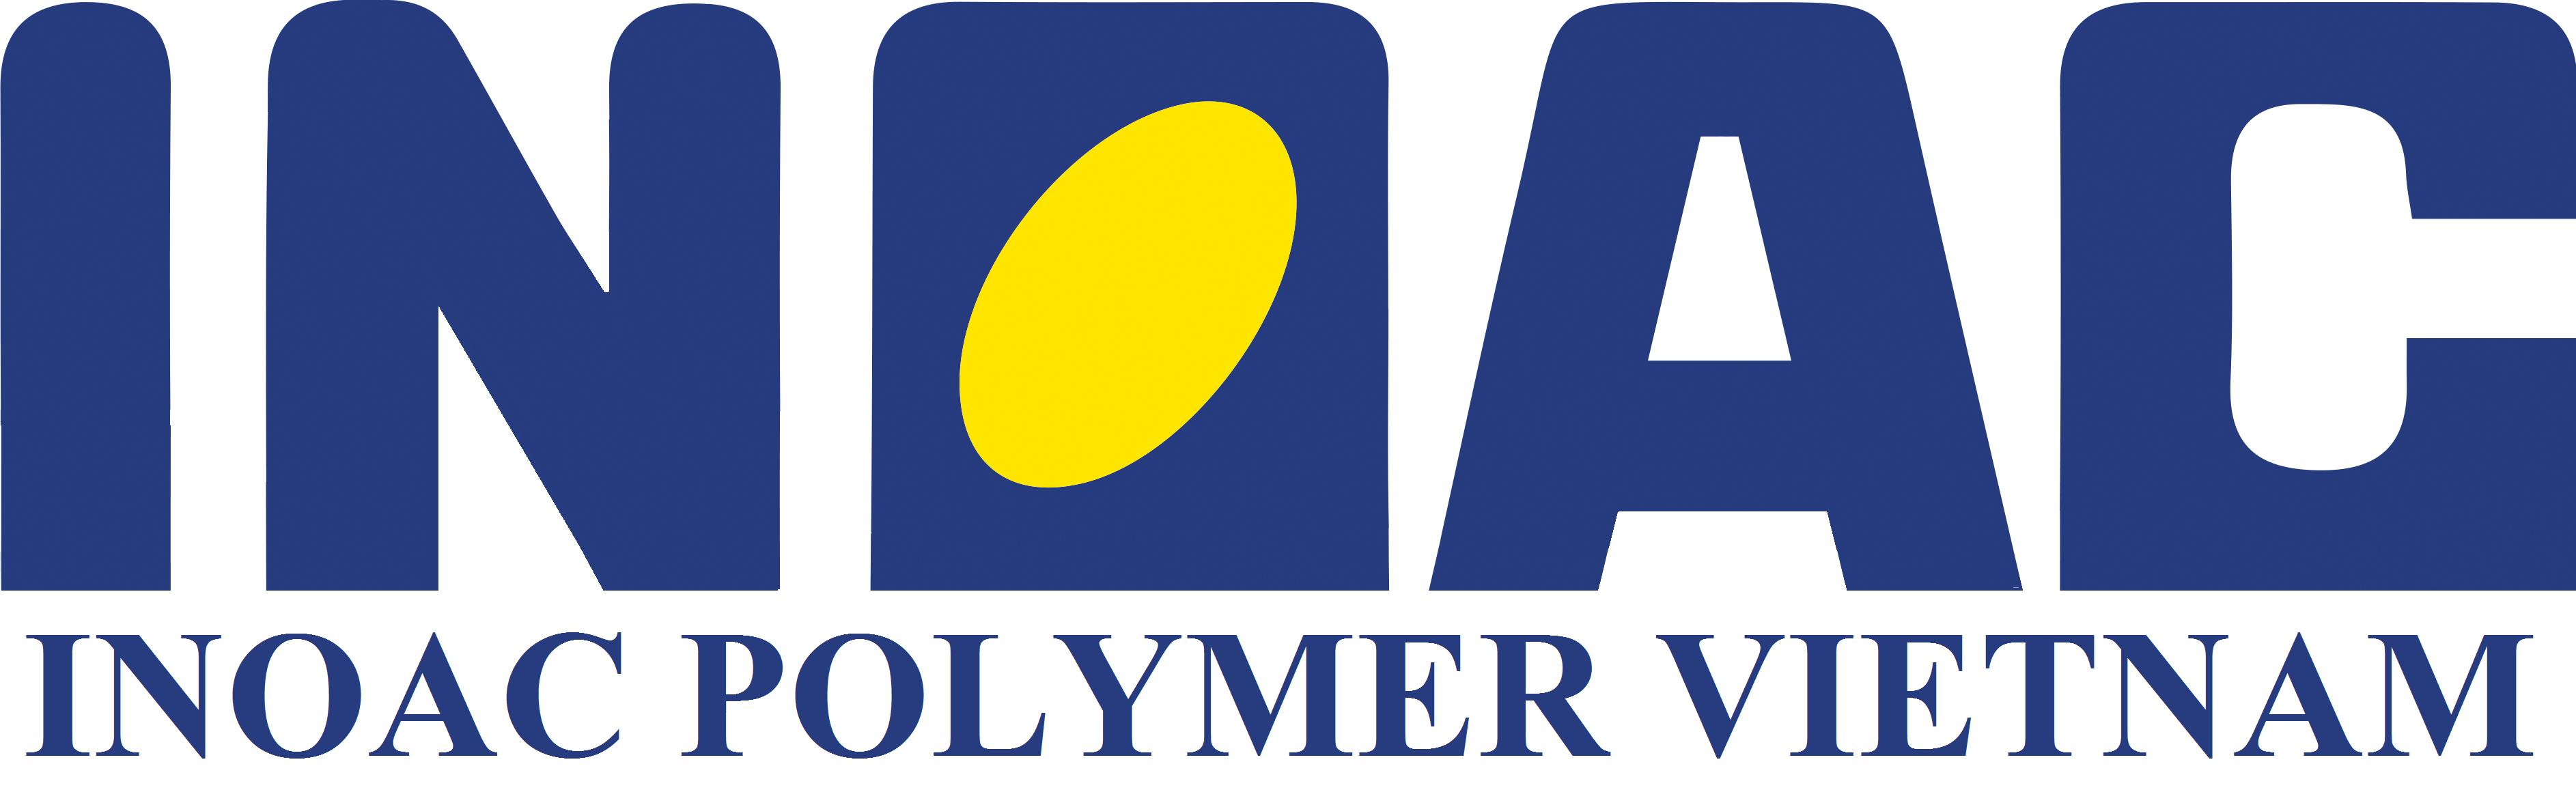 Inoac Polymer